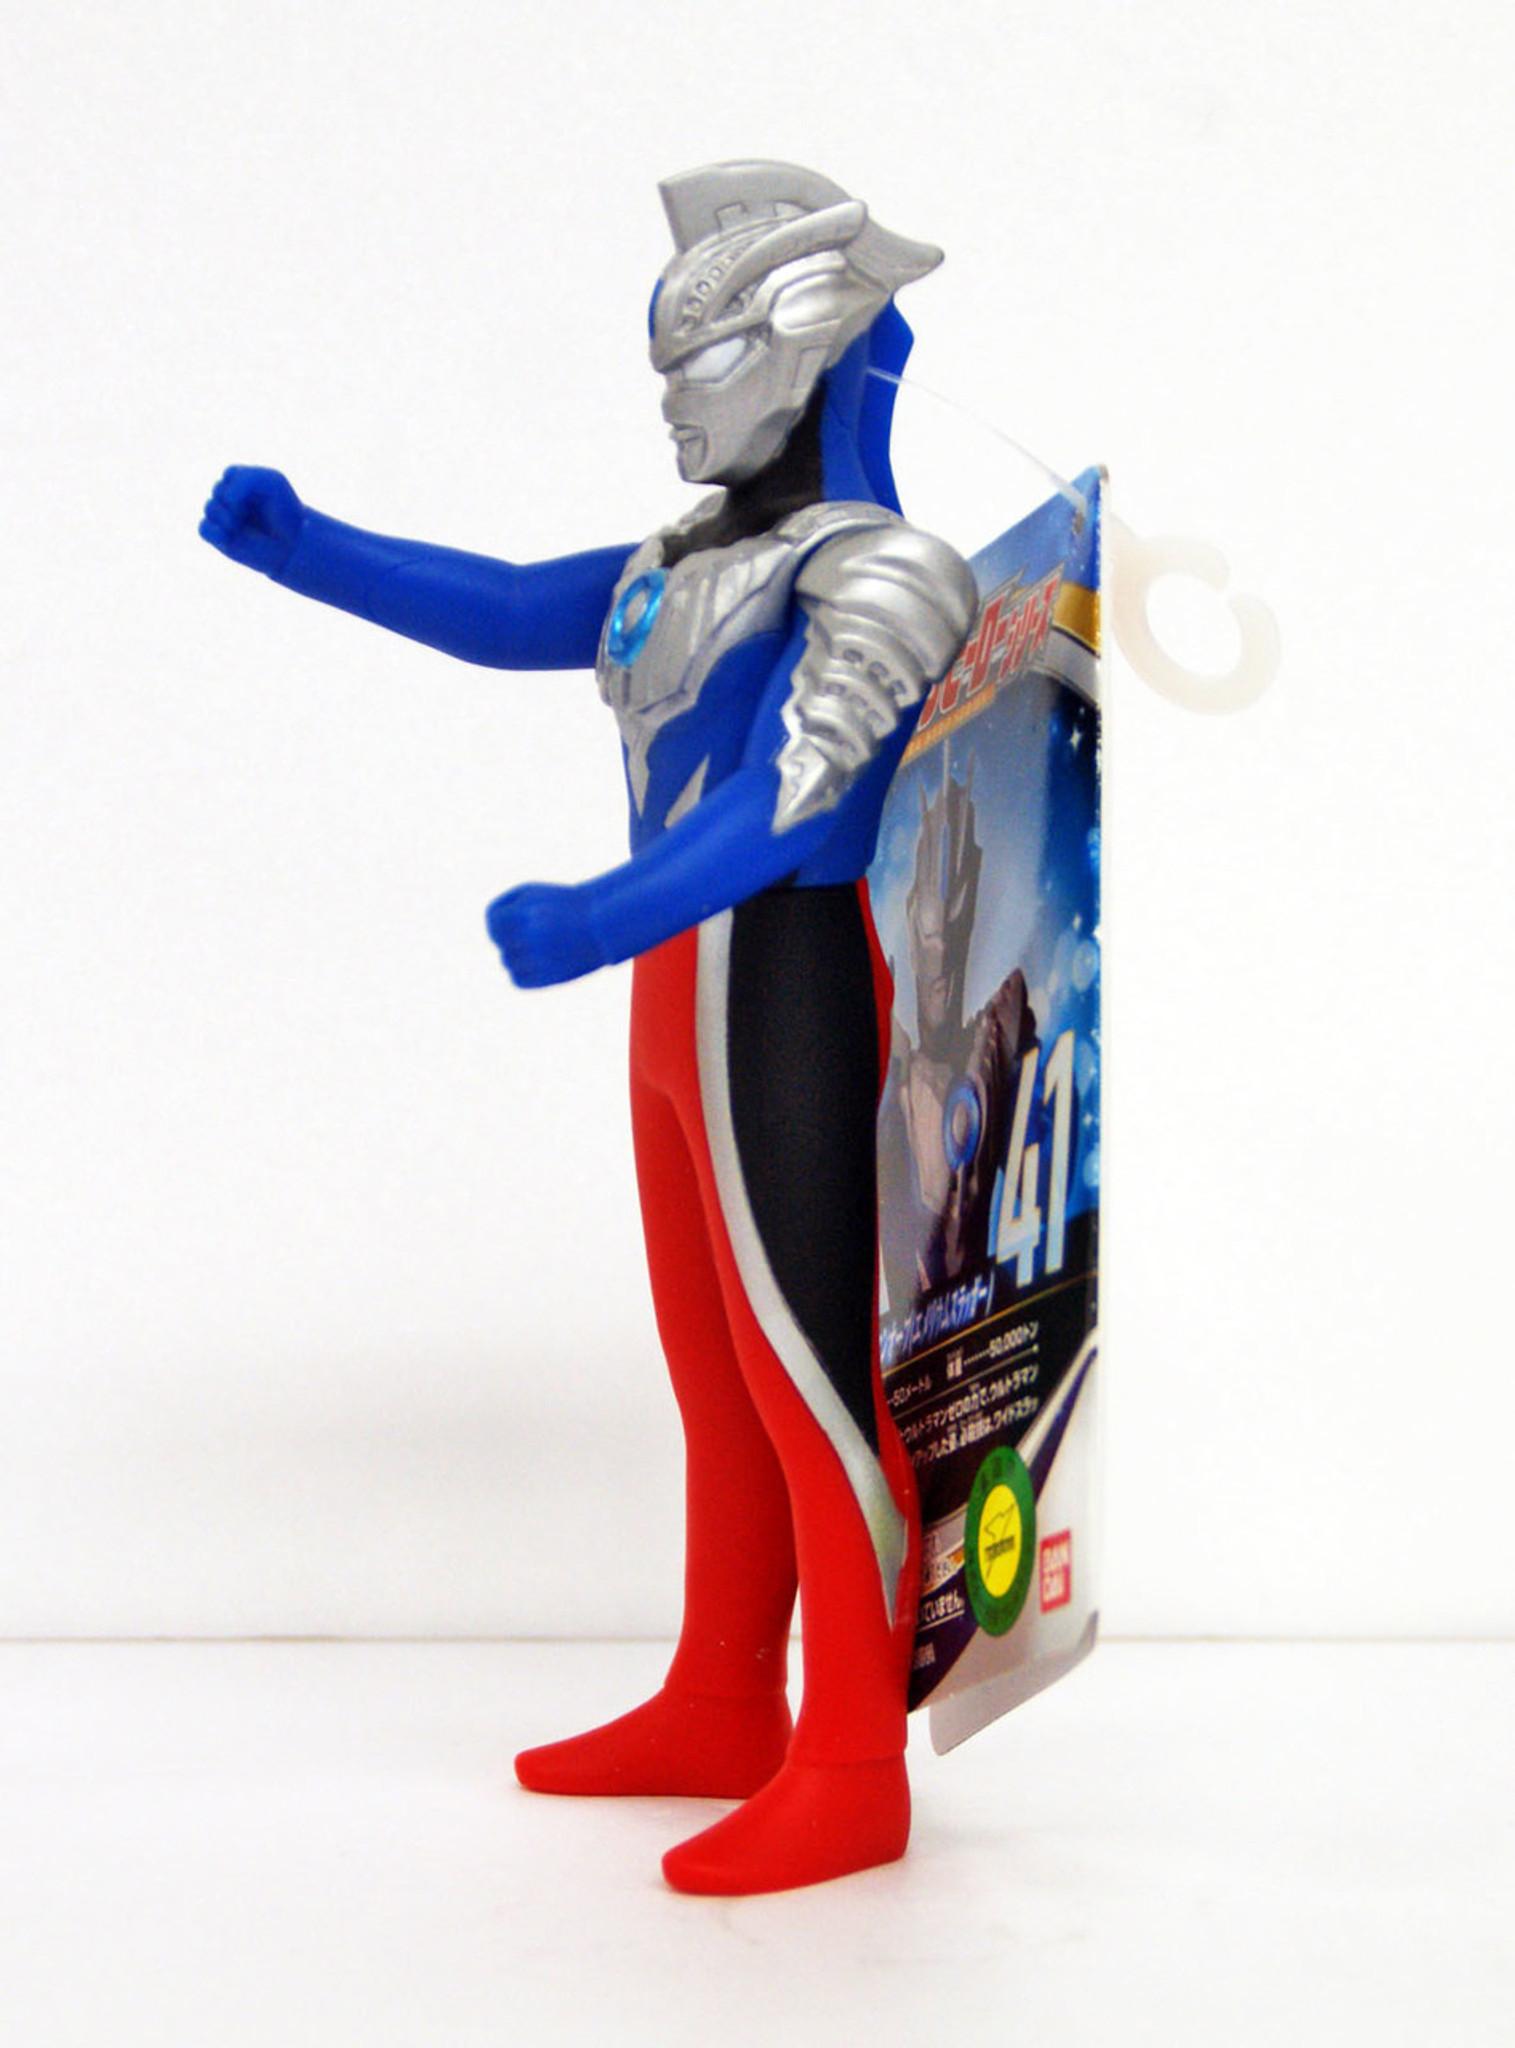 Bandai Ultra Hero 500 Series 40 Ultraman Orb Lightning Attacker 0479479 Shf Act Origin 15163 117230 No41 Emerium Slugger Figure